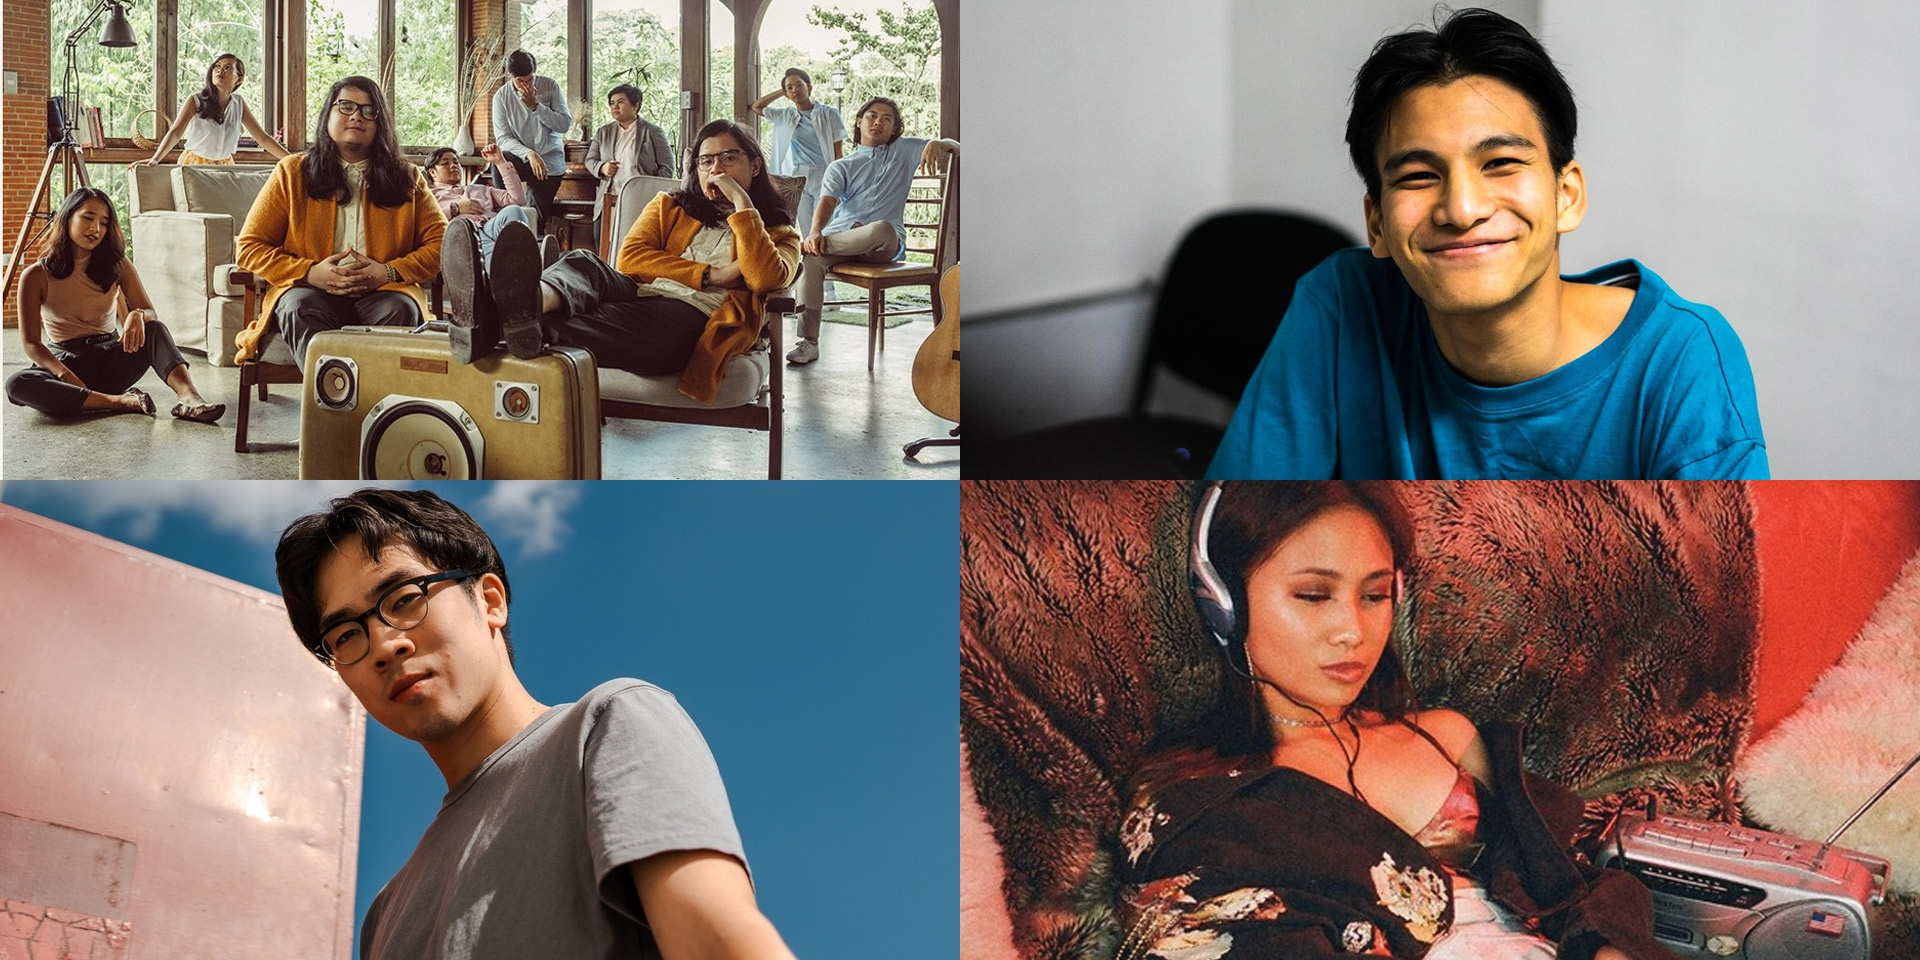 Ben&Ben, NIKI, Charlie Lim, Phum Viphurit break into Apple Music's Best of 2018: Editors' Picks